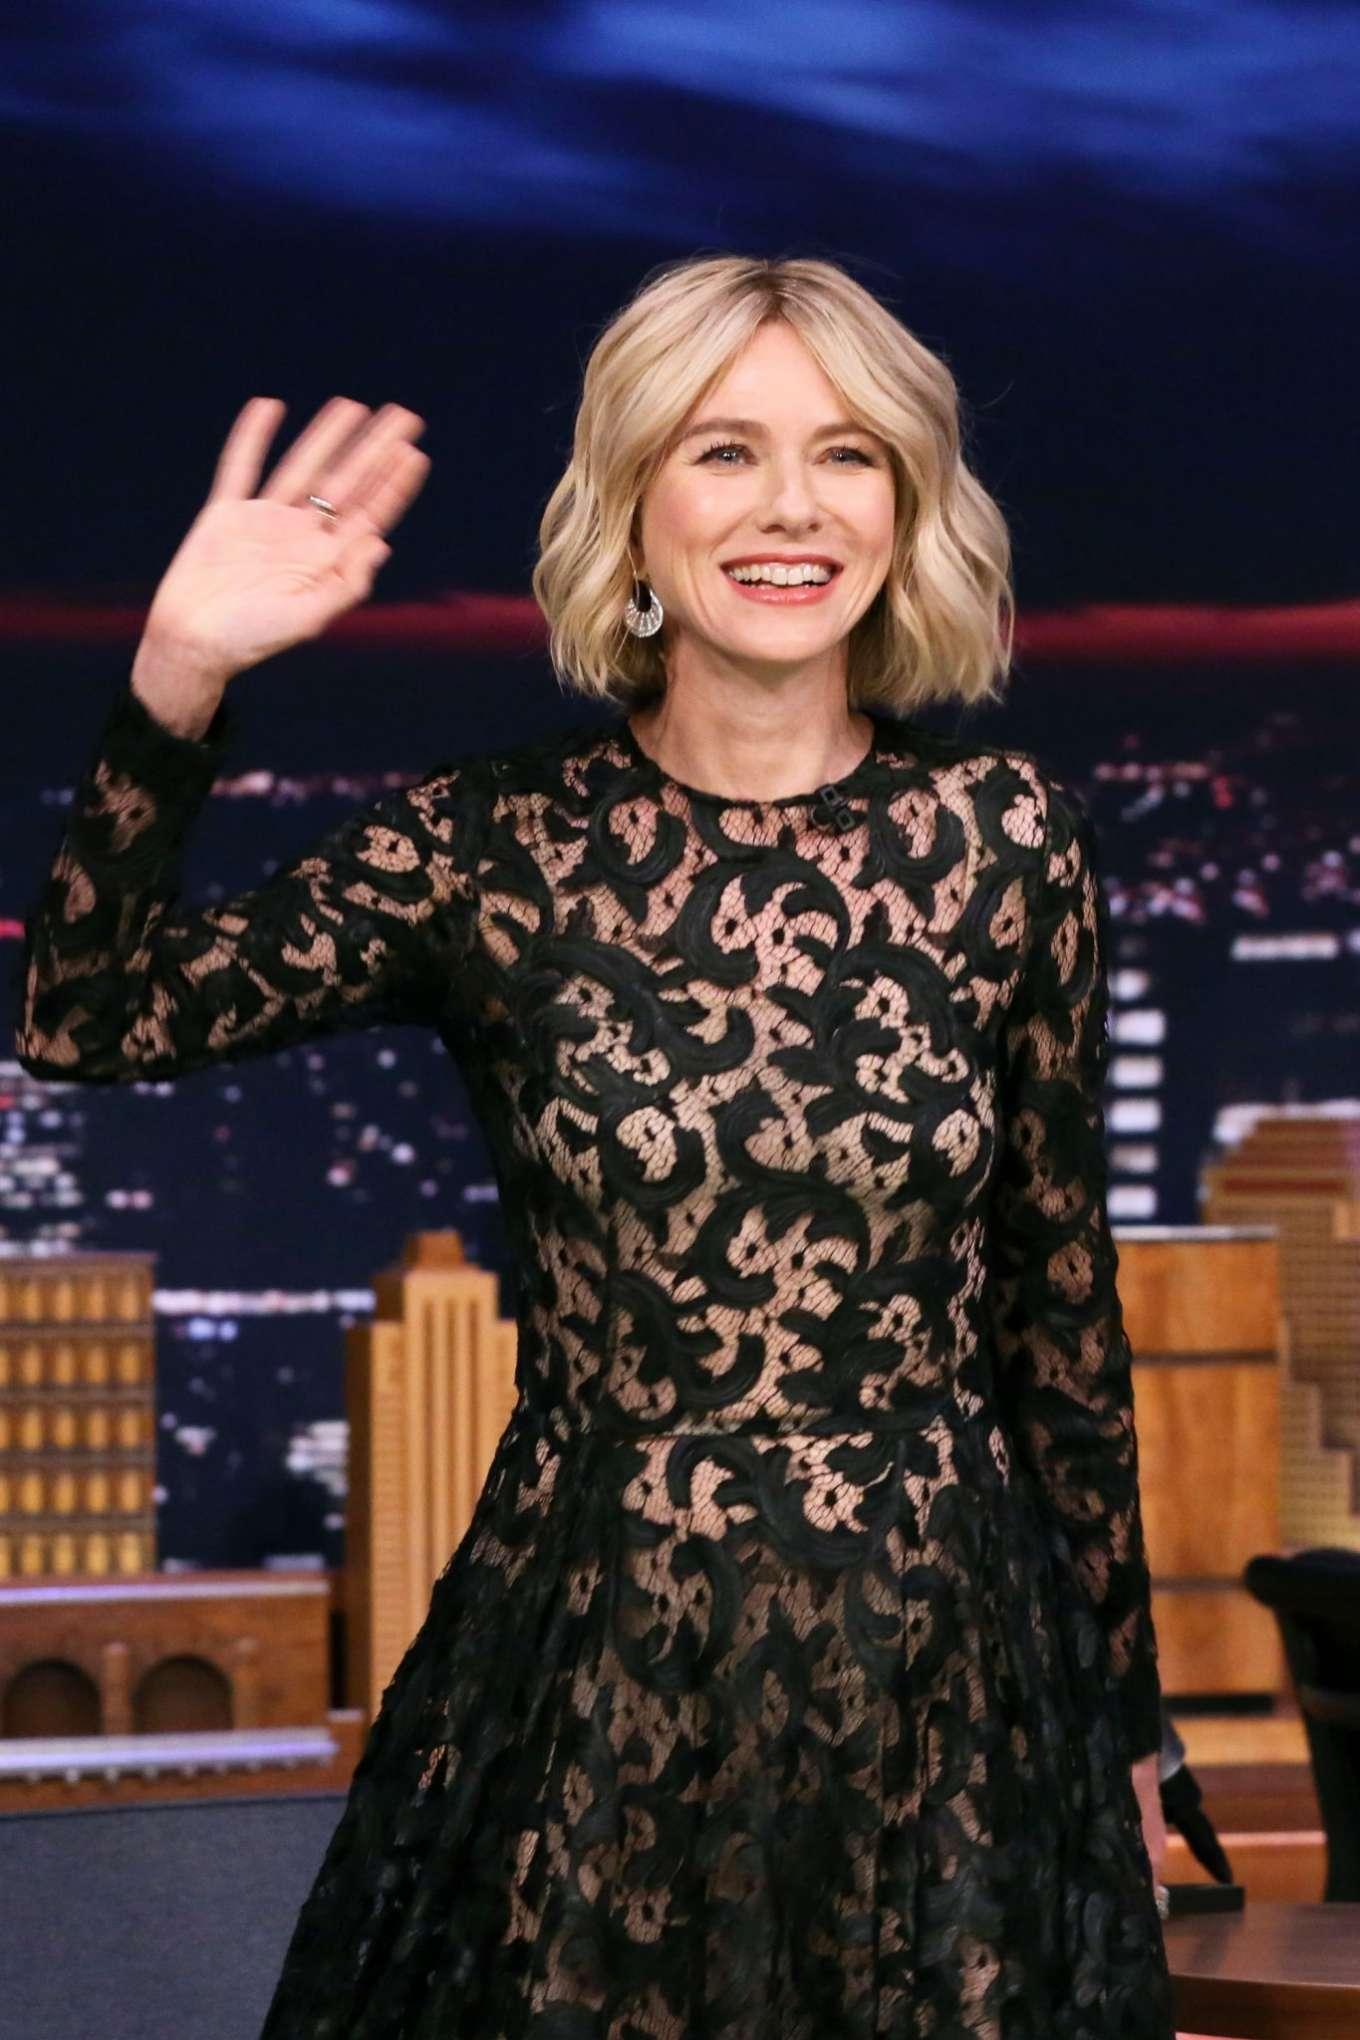 Naomi Watts - On 'The Tonight Show Starring Jimmy Fallon' in NYC